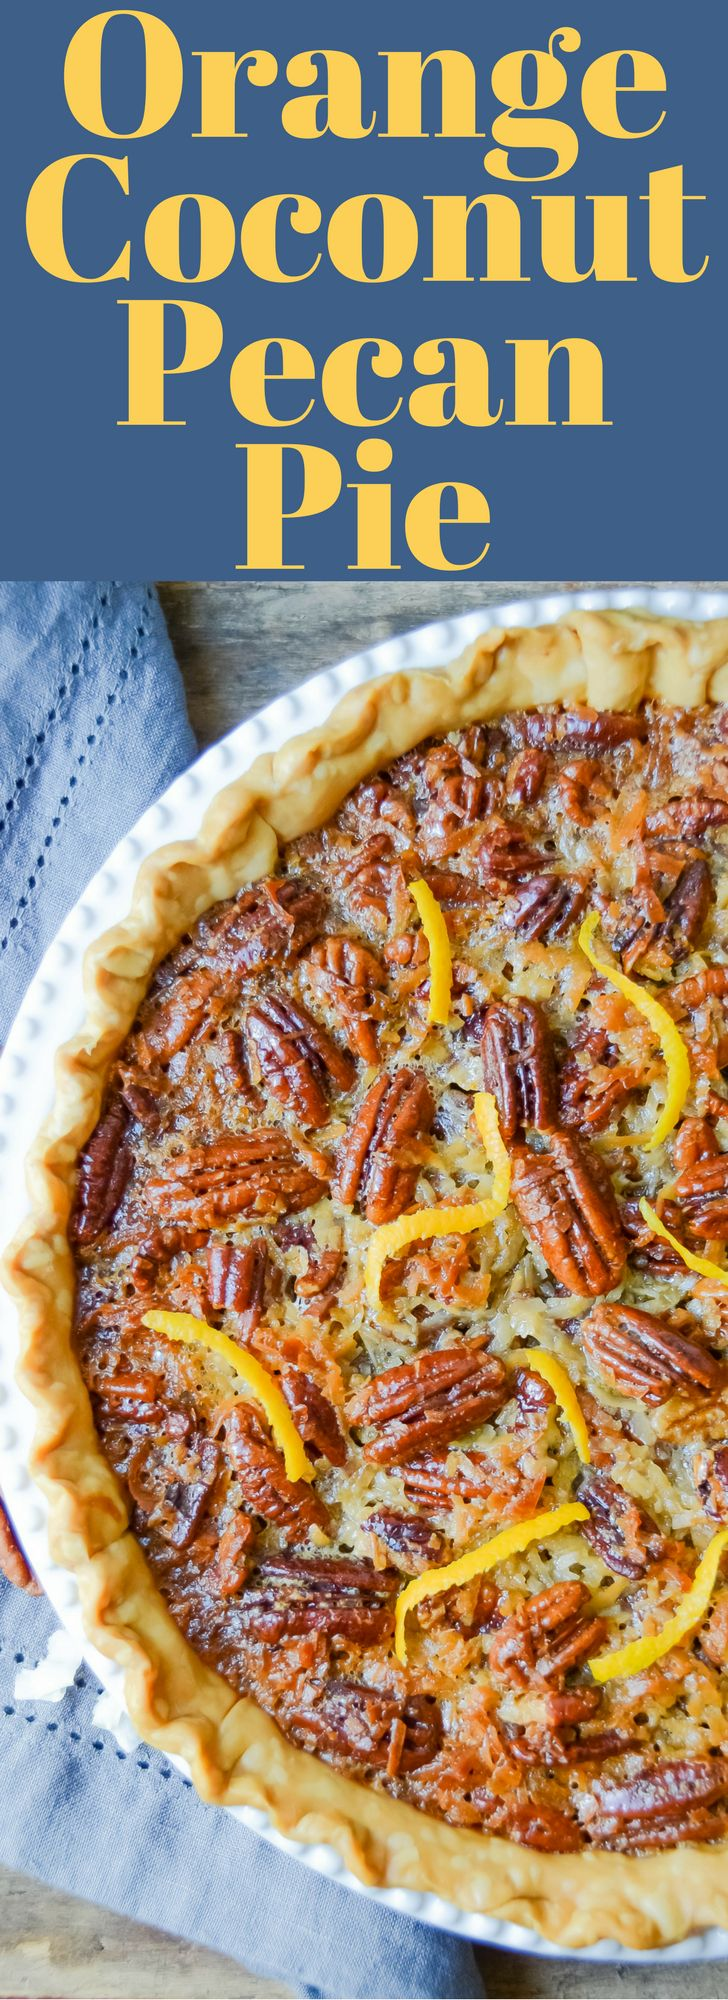 This easy Orange Coconut Pecan Pie is a delicious twist on the classic original pecan pie recipe. The BEST holiday dessert!